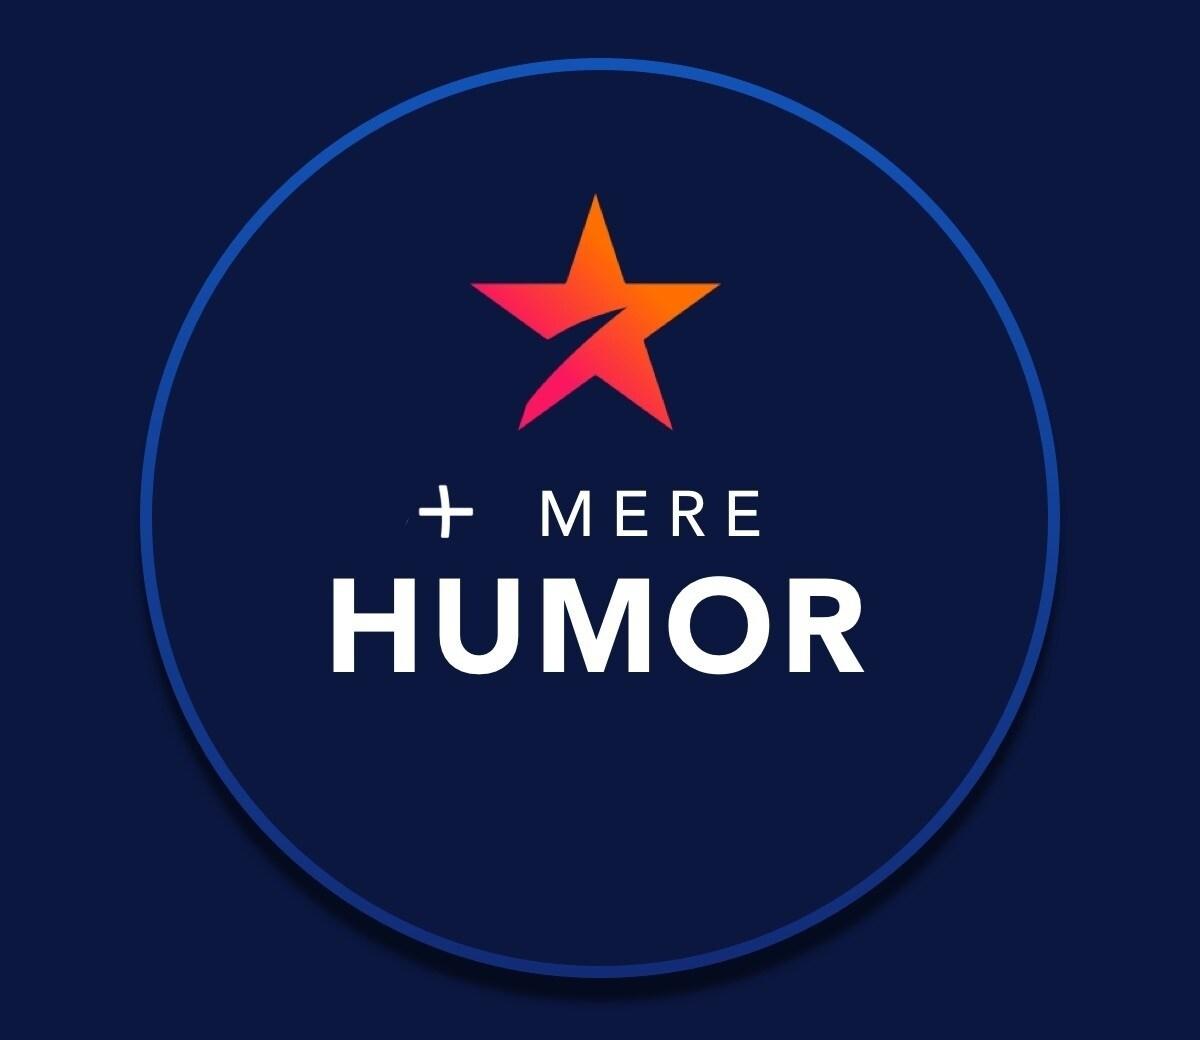 + Mere humor